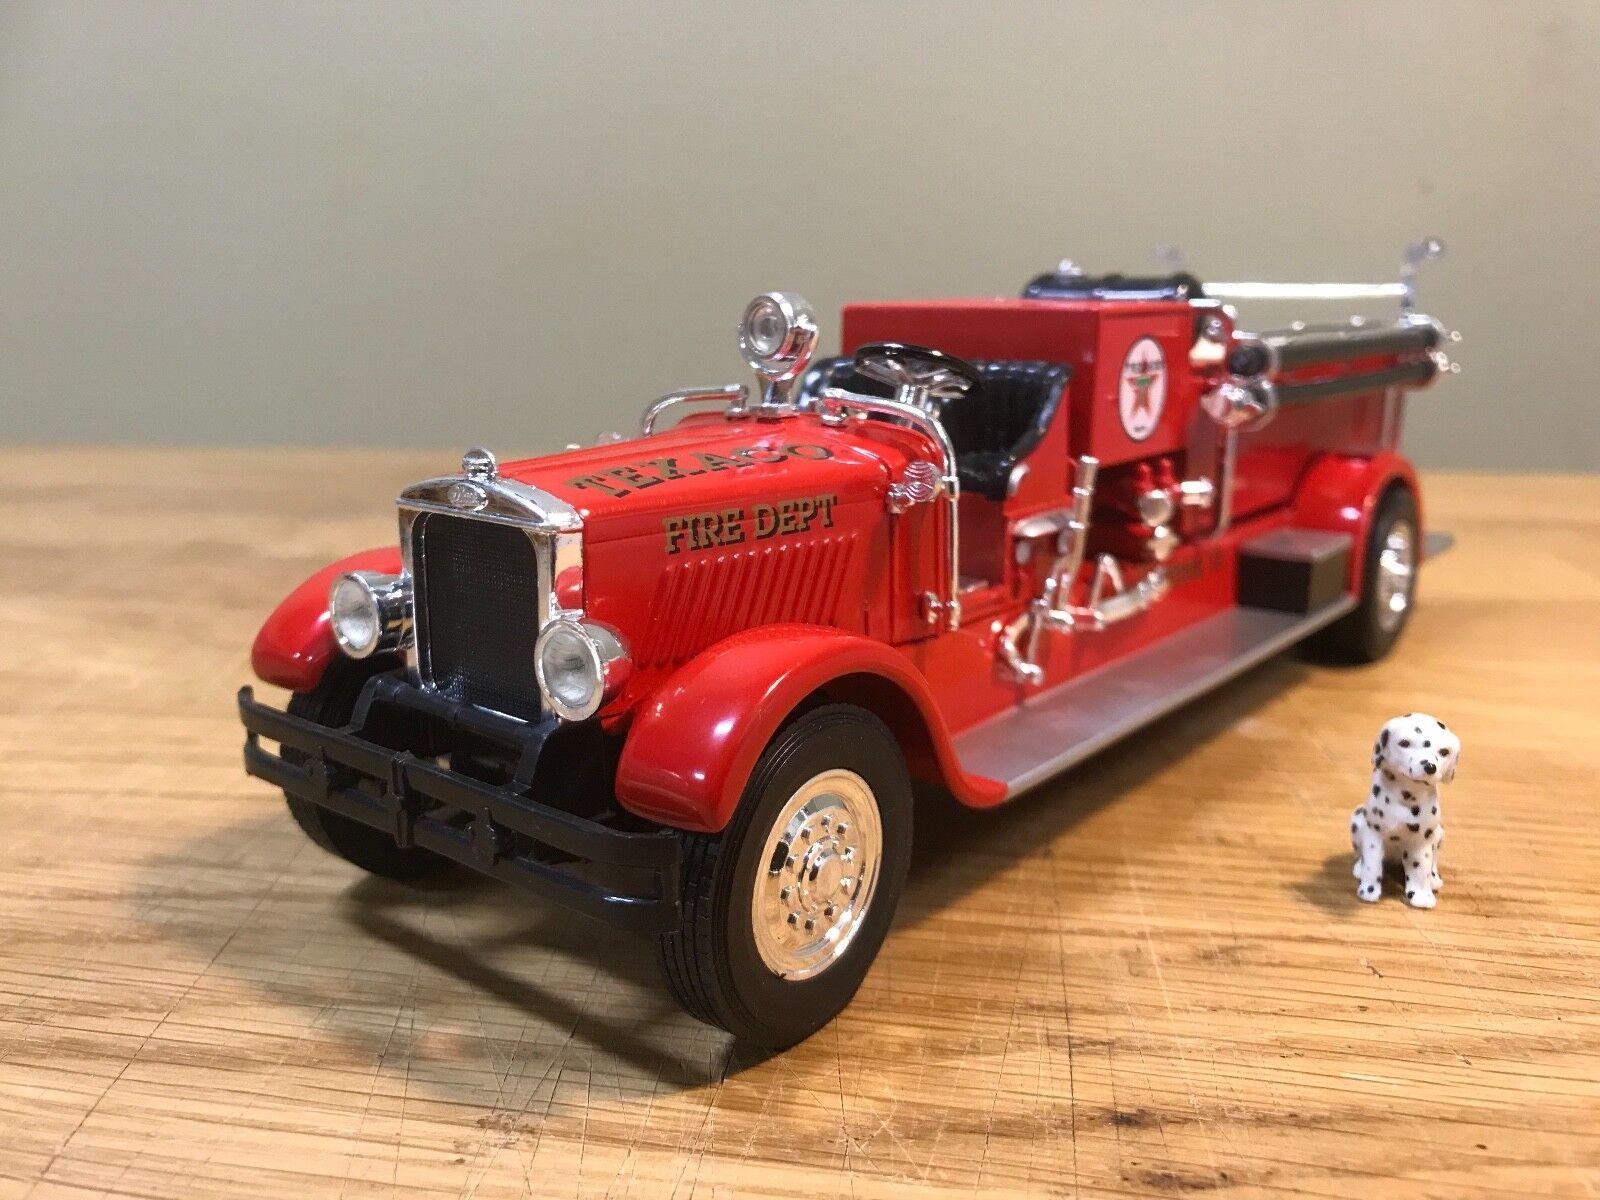 Texaco 1929 Mack Camión de Bomberos, tipo 90 autobomba - 15th en serie